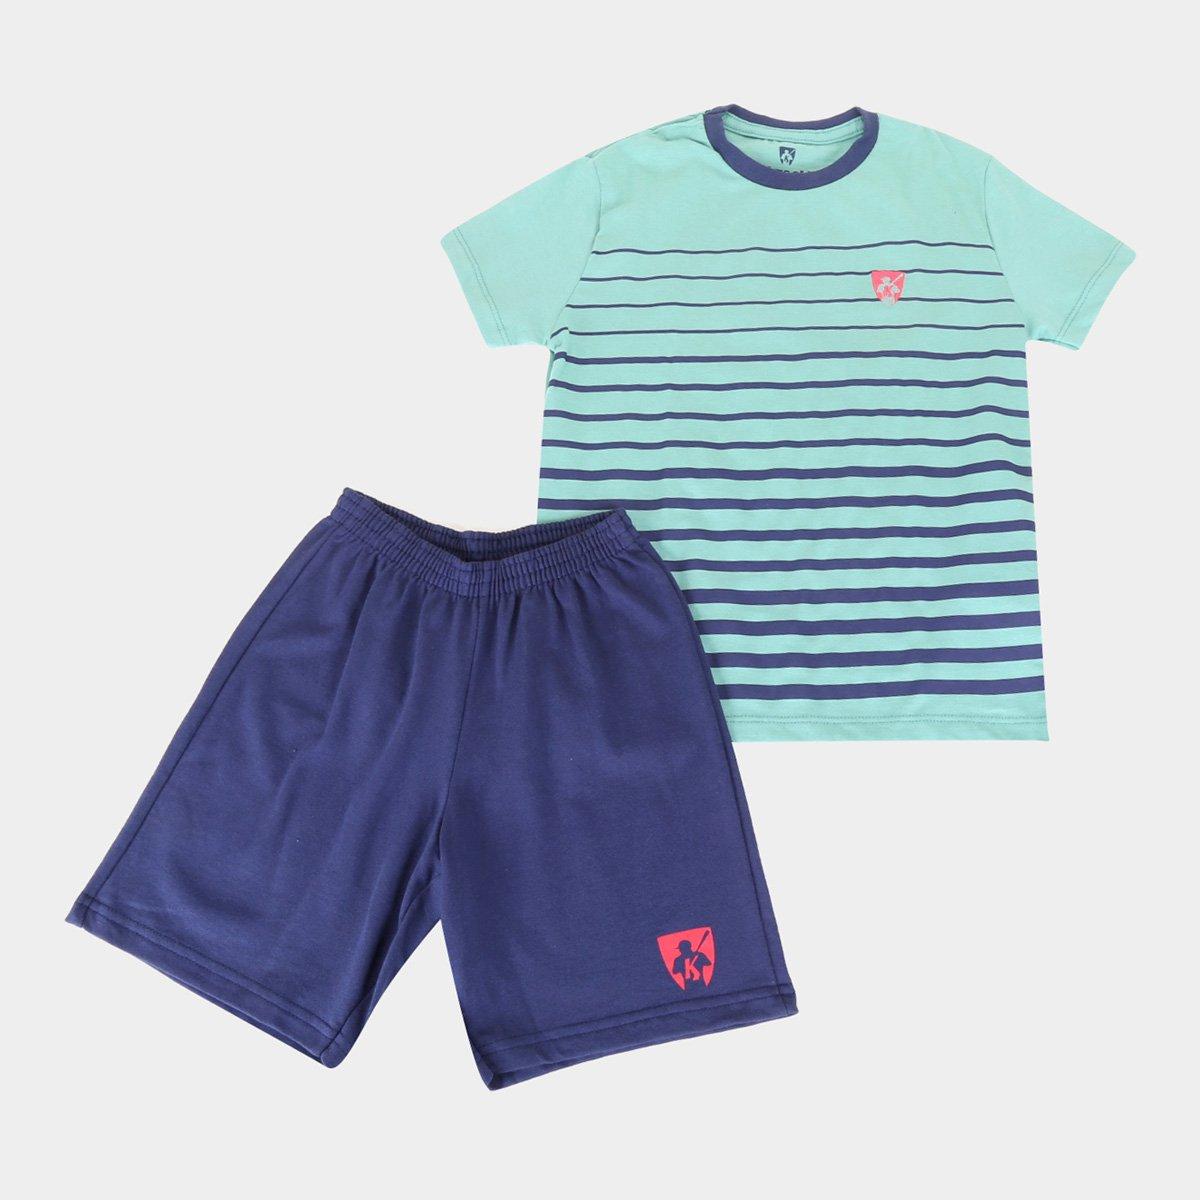 Conjunto Infantil MR. Kitsch Camiseta Listras + Short Liso Masculino